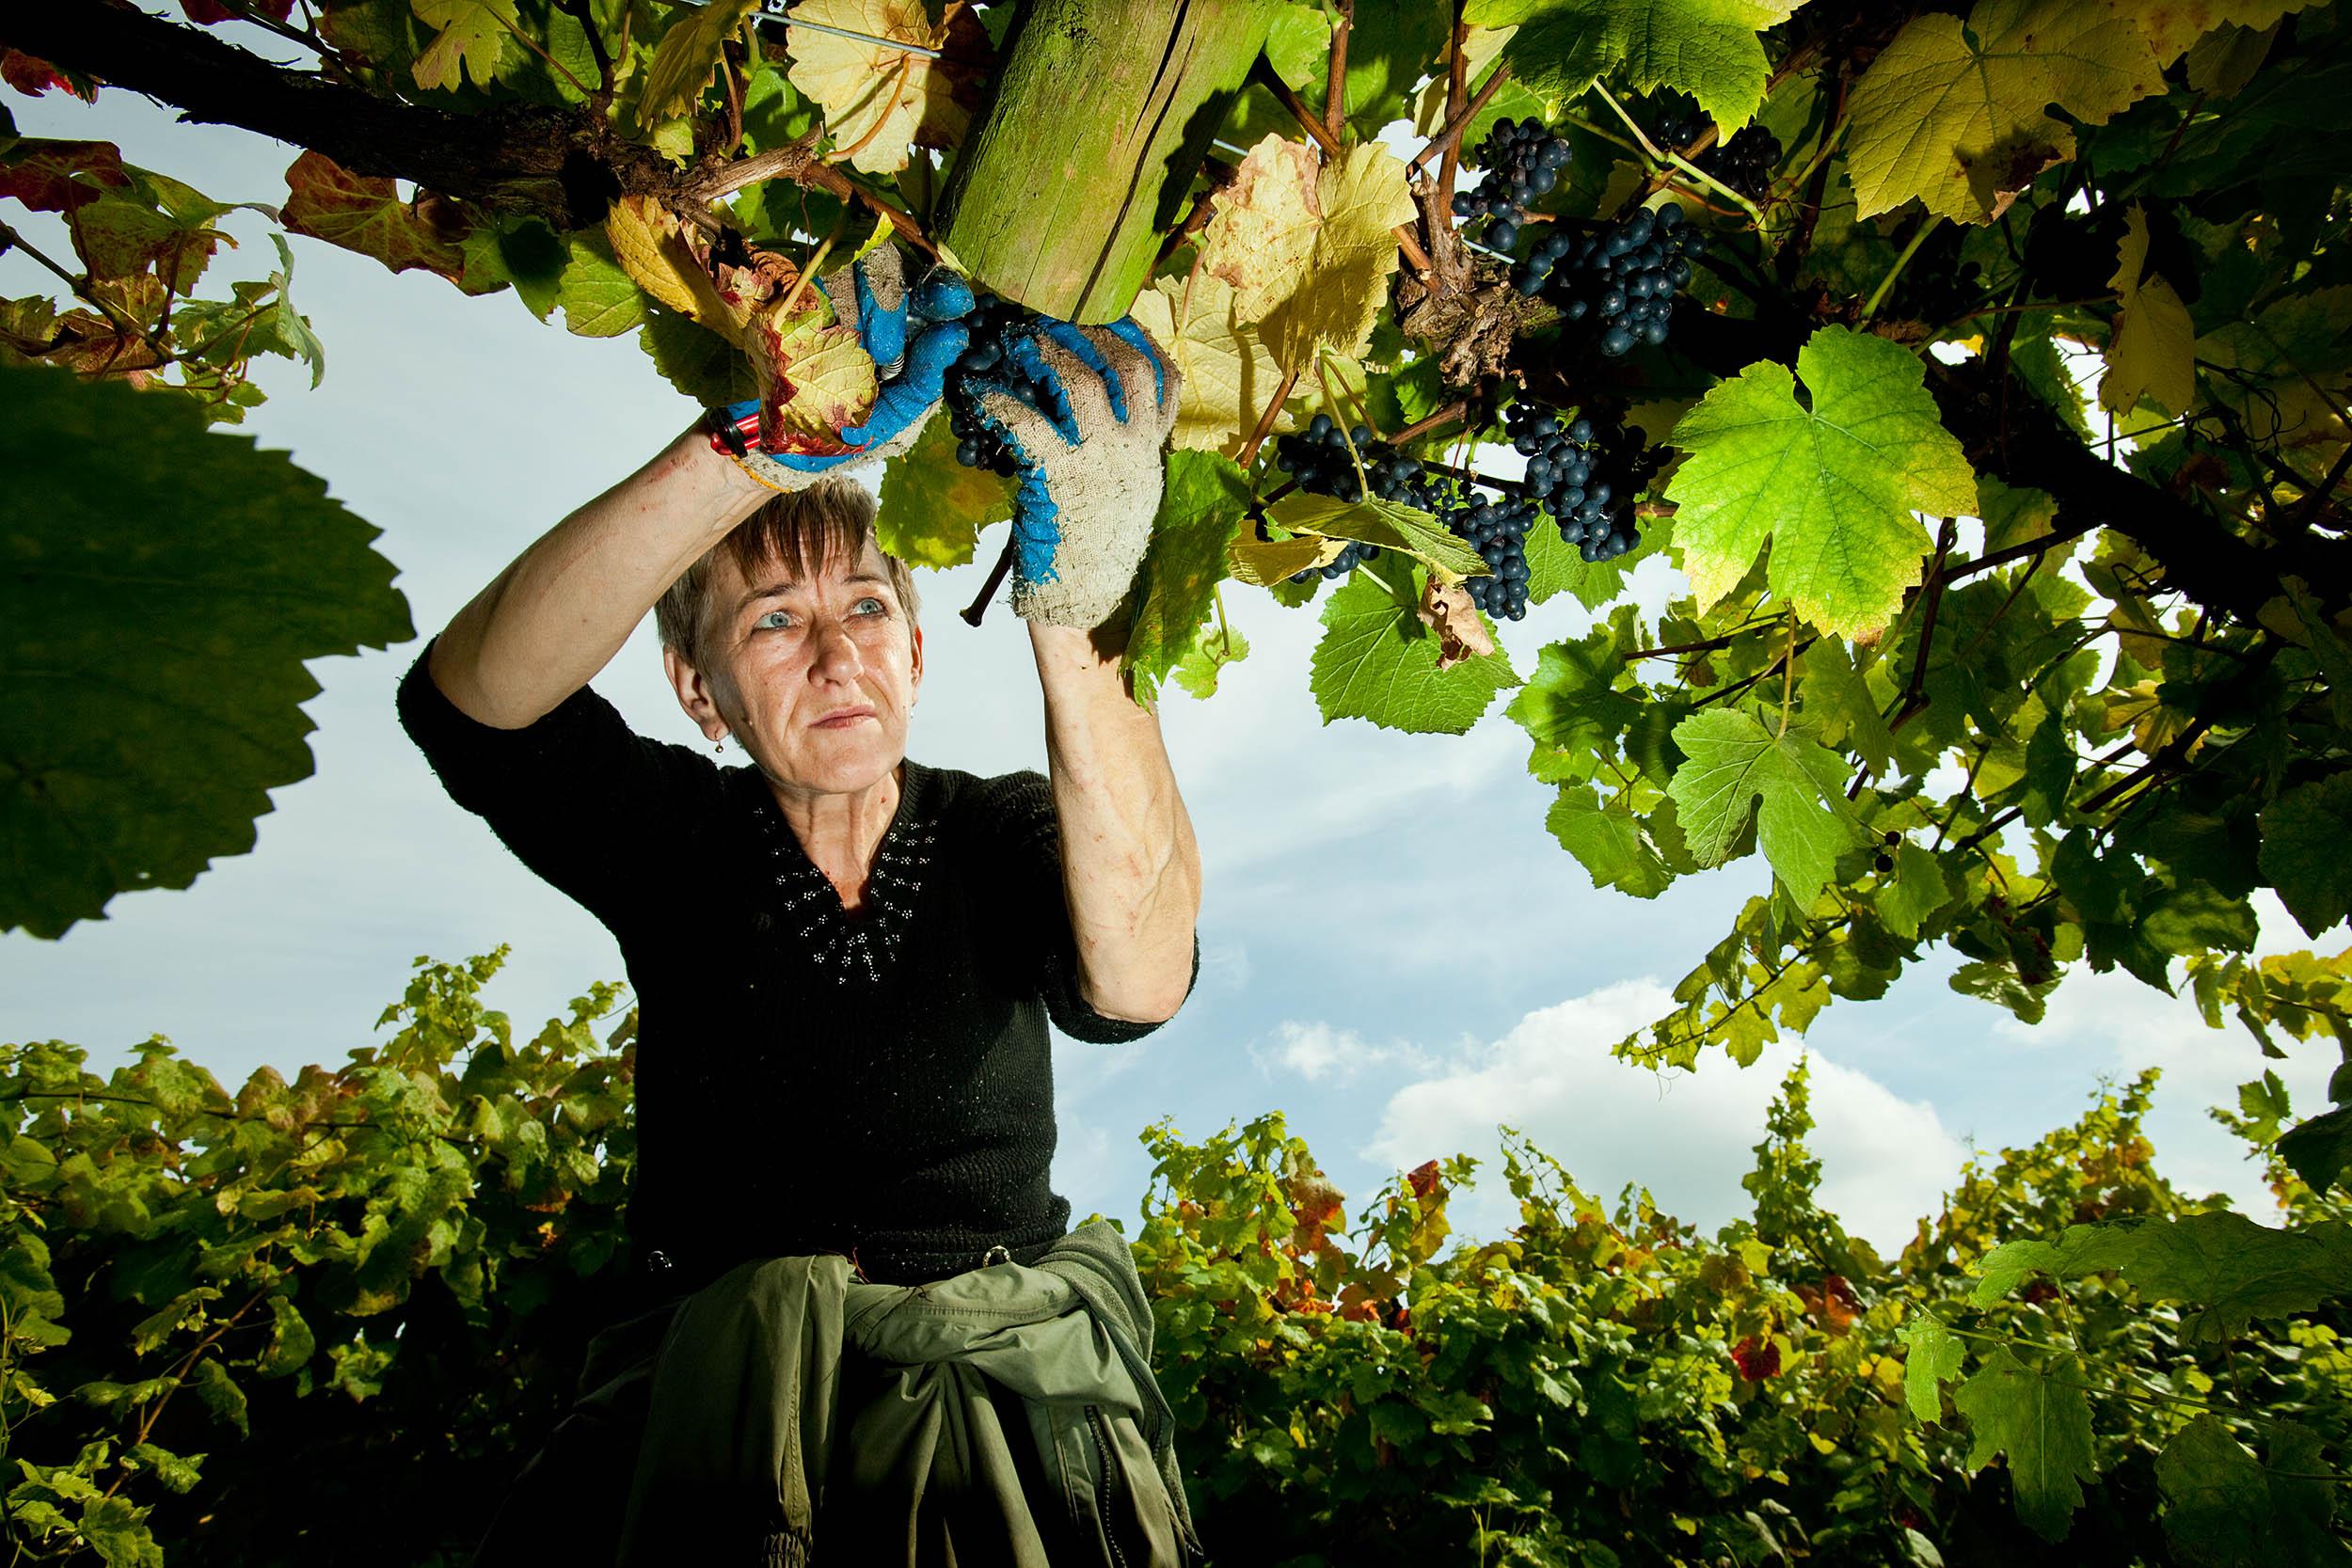 Polish woman at work in an English vineyard